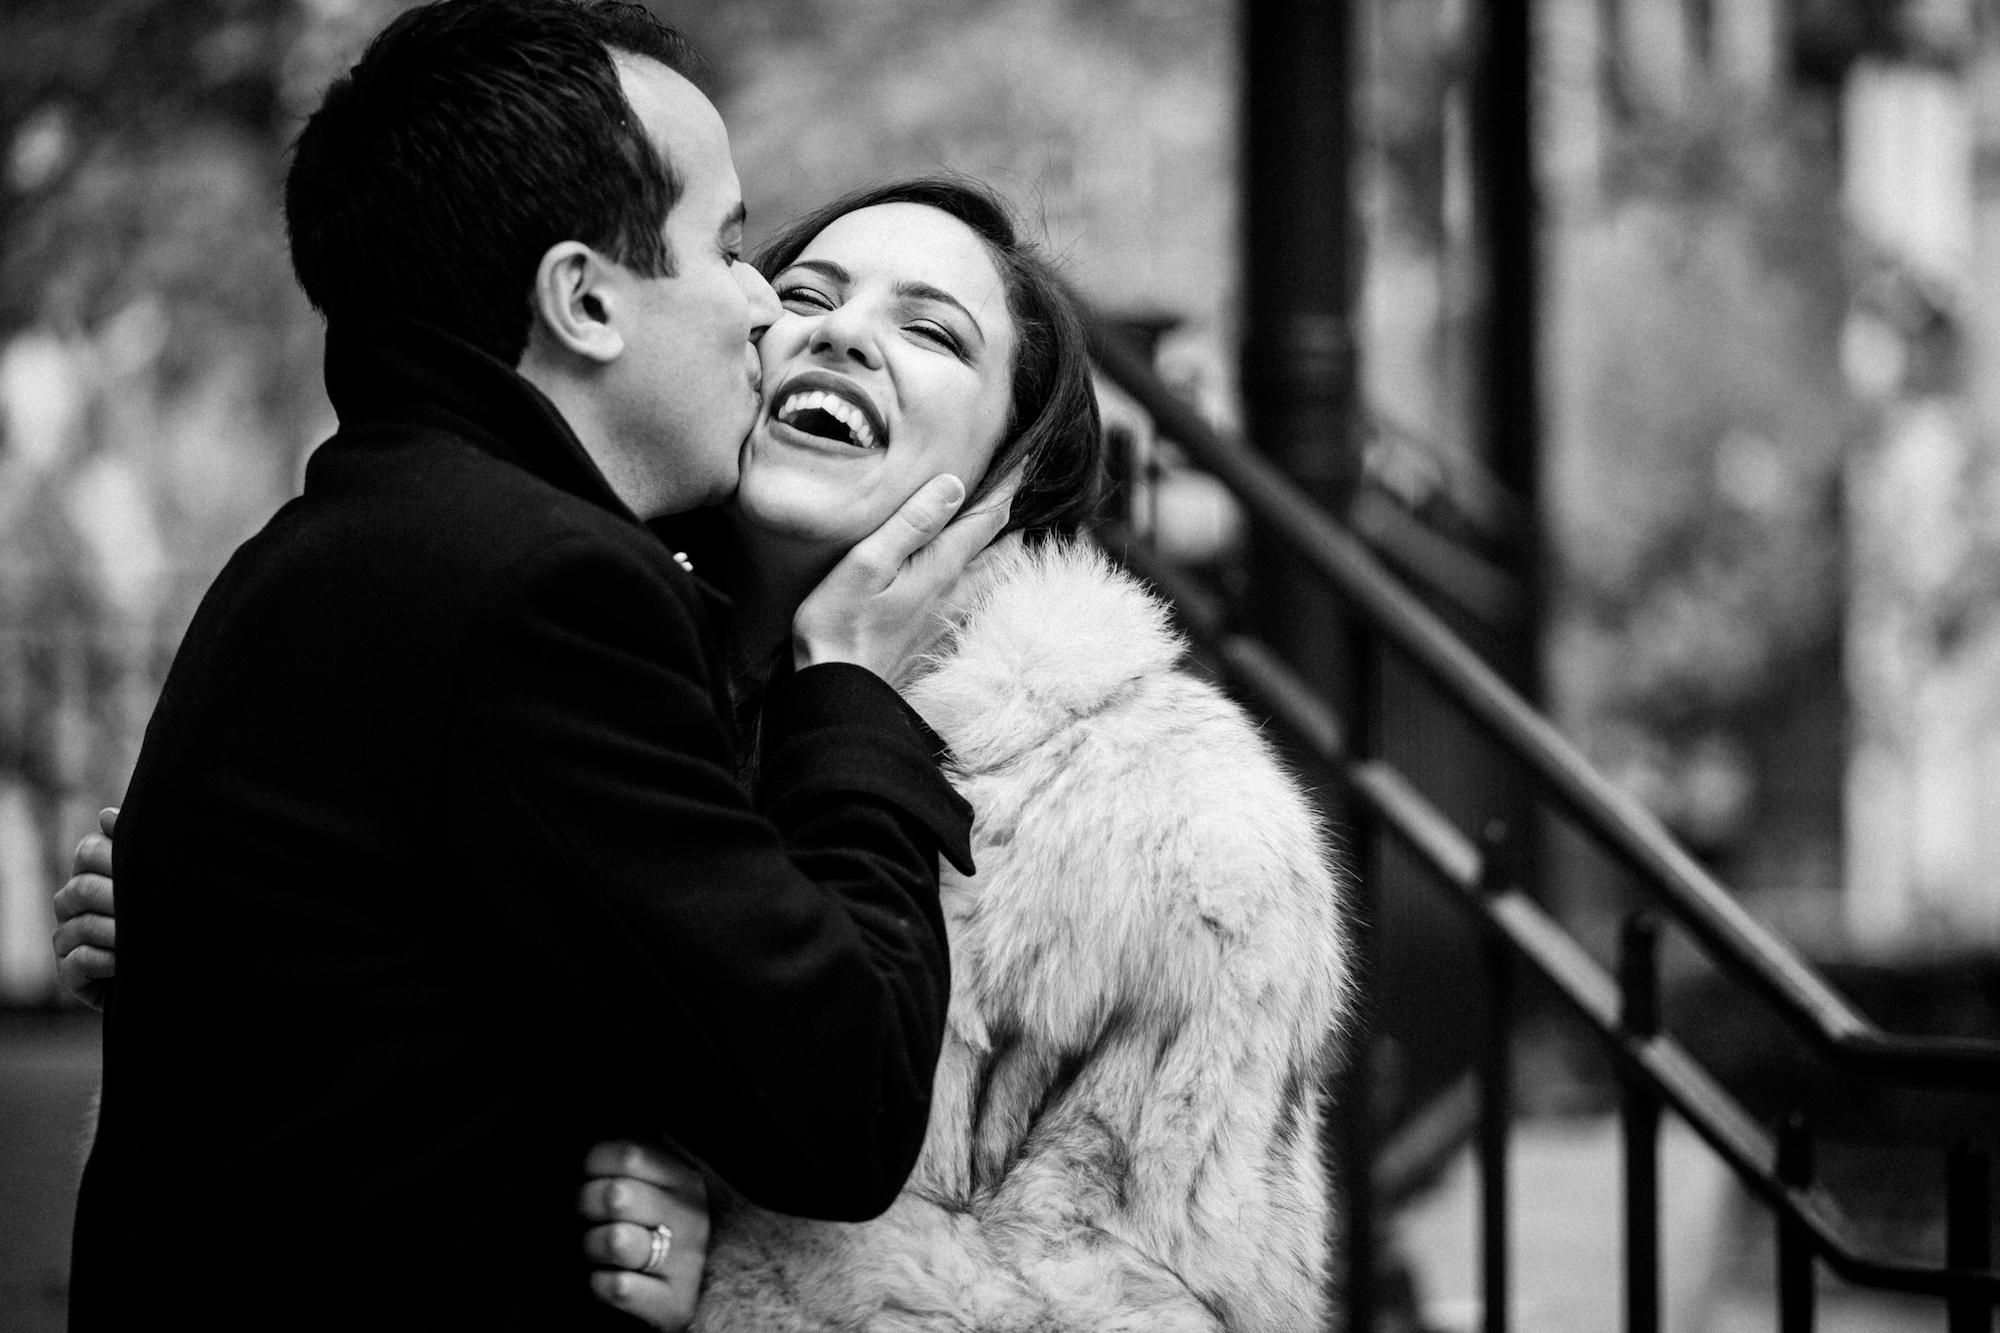 HD Mariage Sana et Ahmed 18 novembre 2017 188 - Dagmara Bojenko - Eco-conscious Weddings, Births & Families